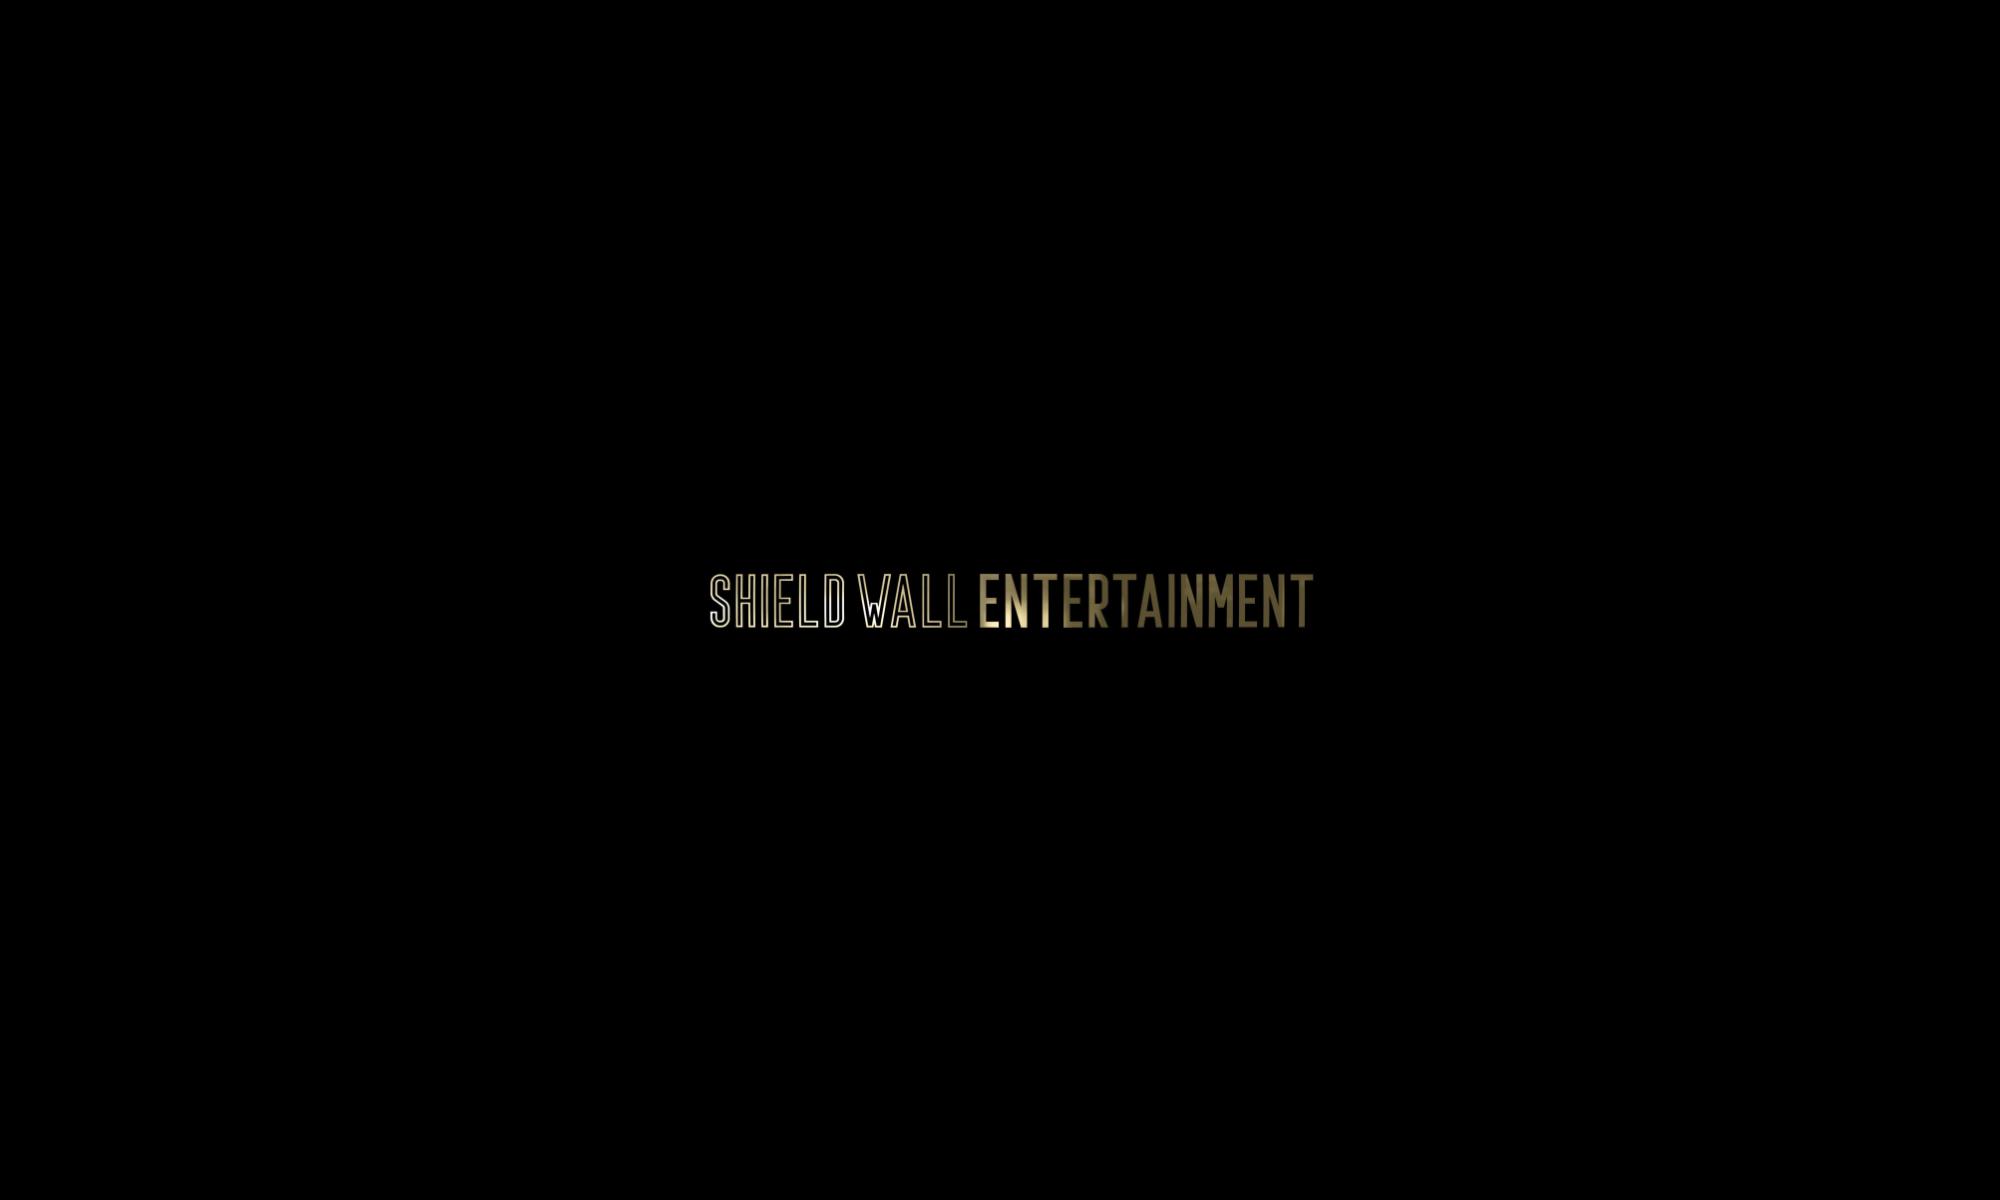 Shield Wall Entertainment